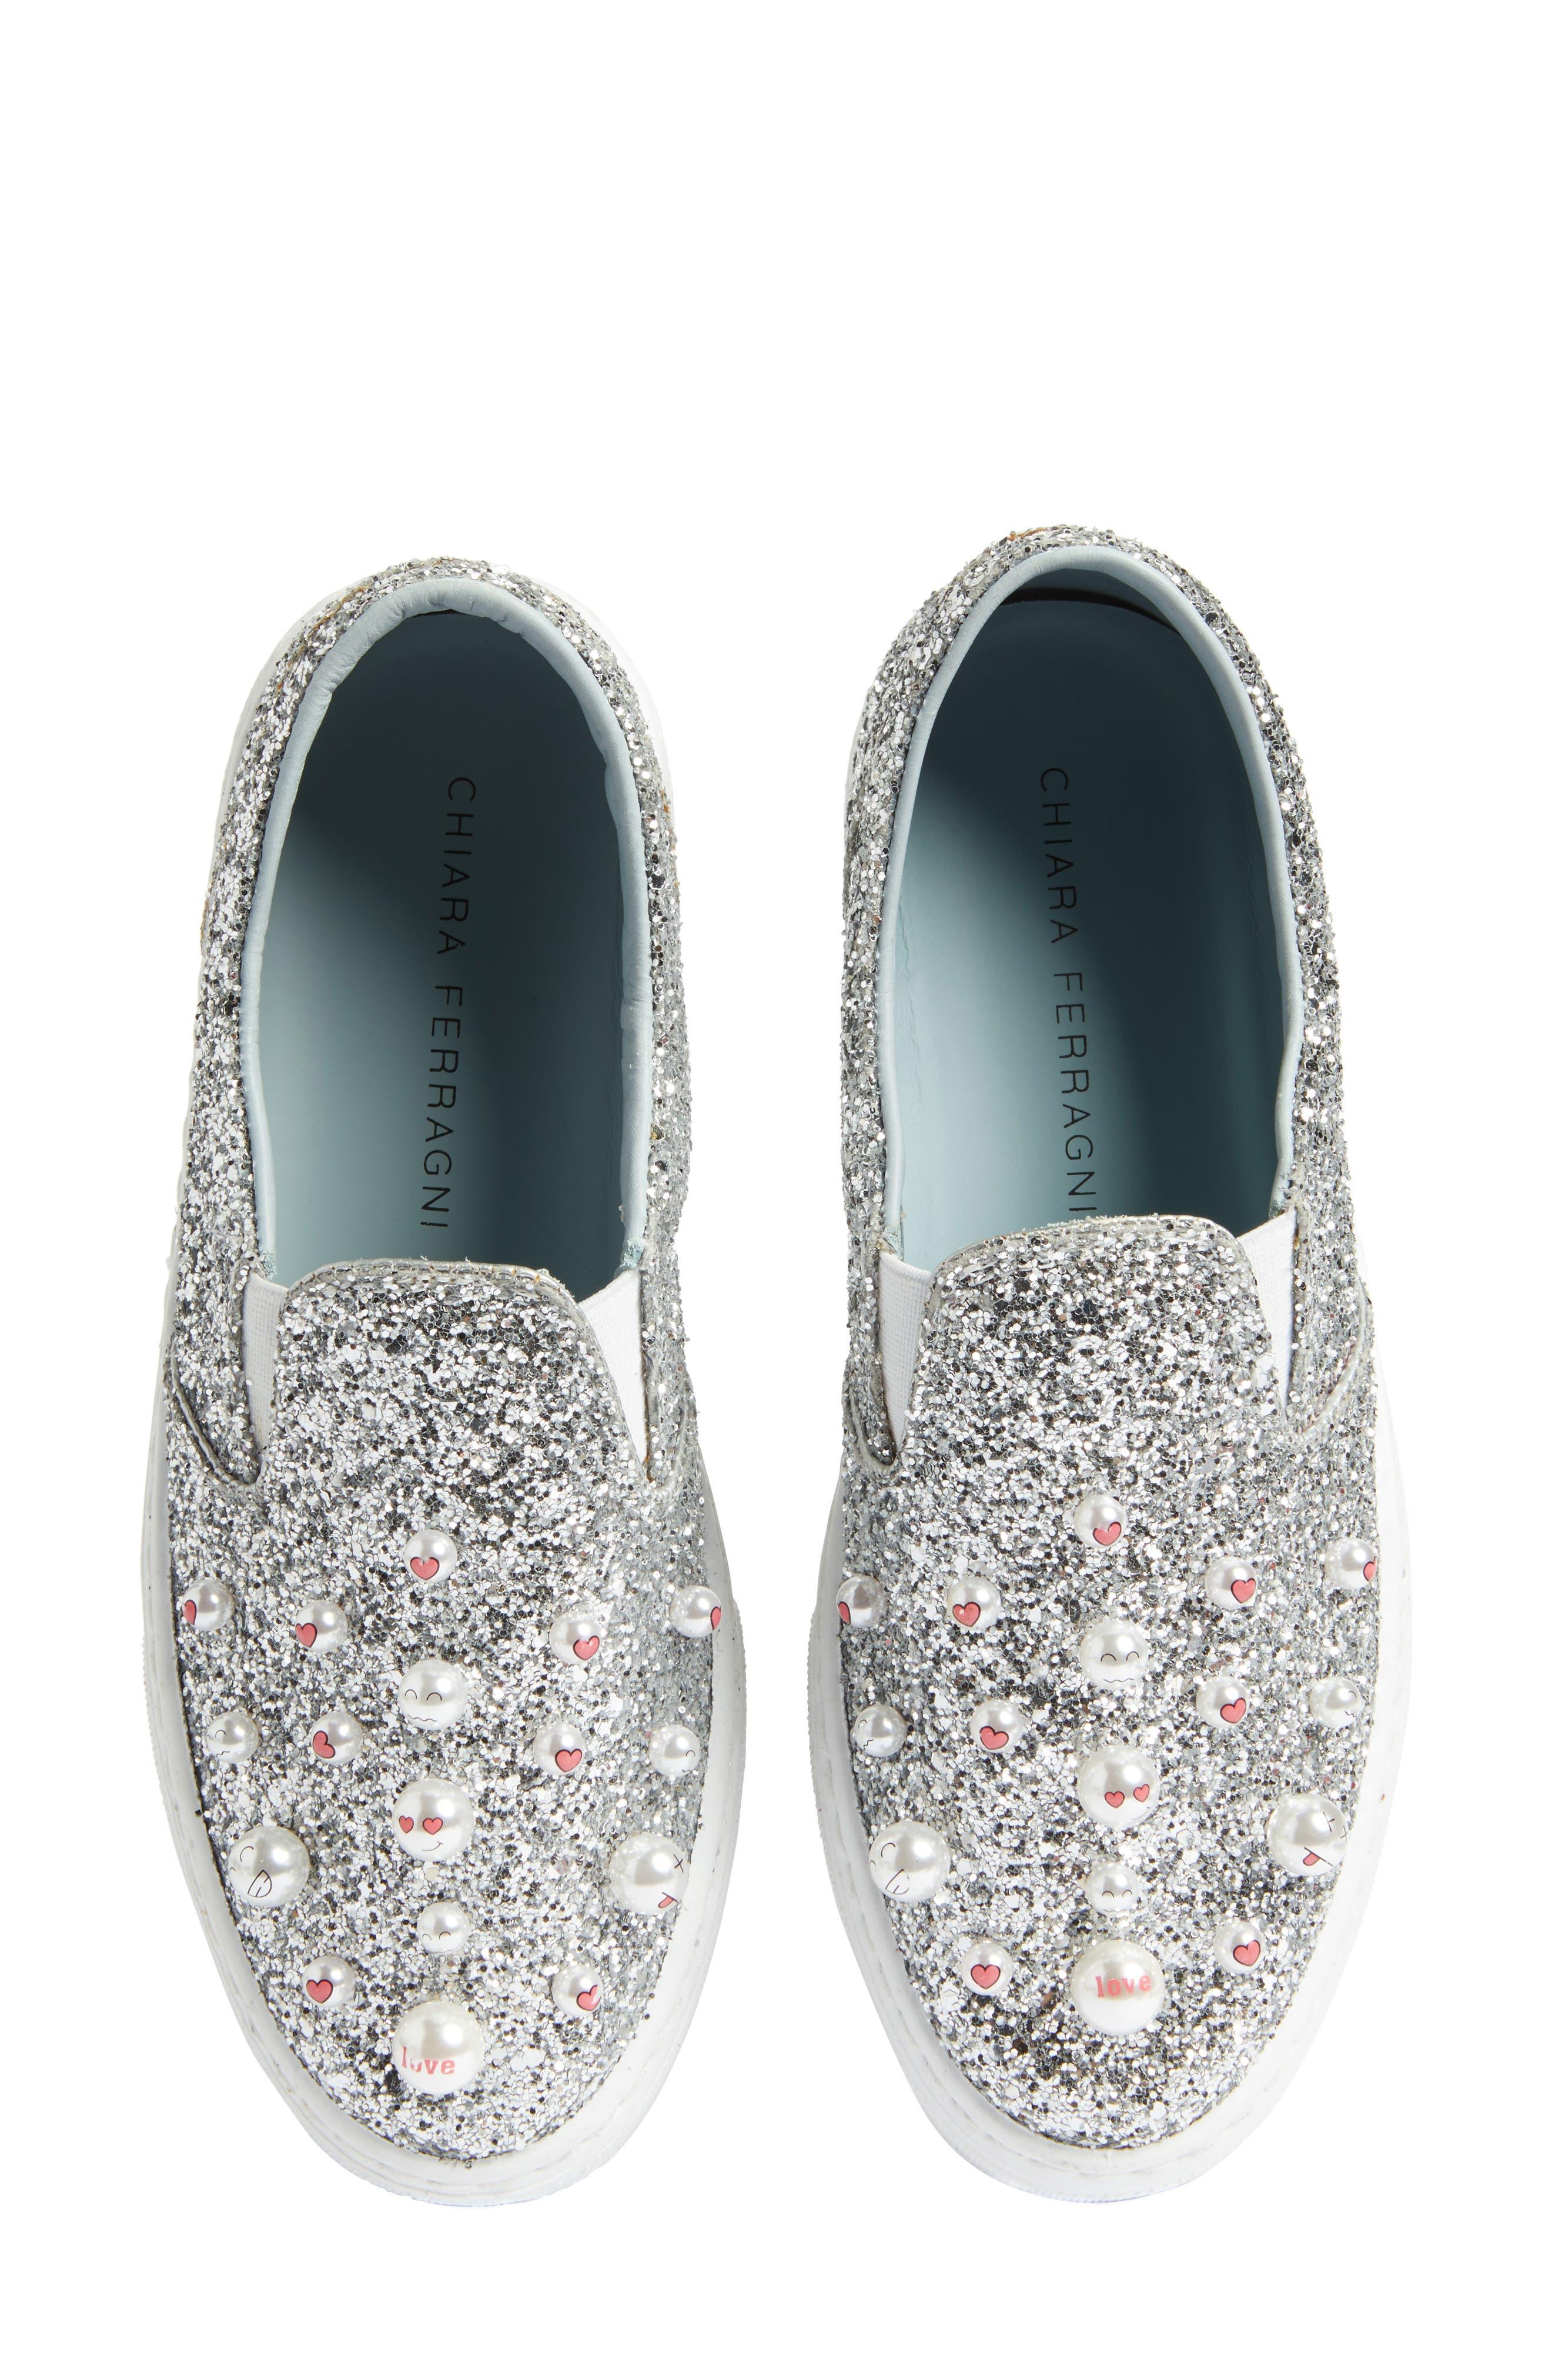 Candies Embellished Slip-On Sneaker,                         Main,                         color, Silver